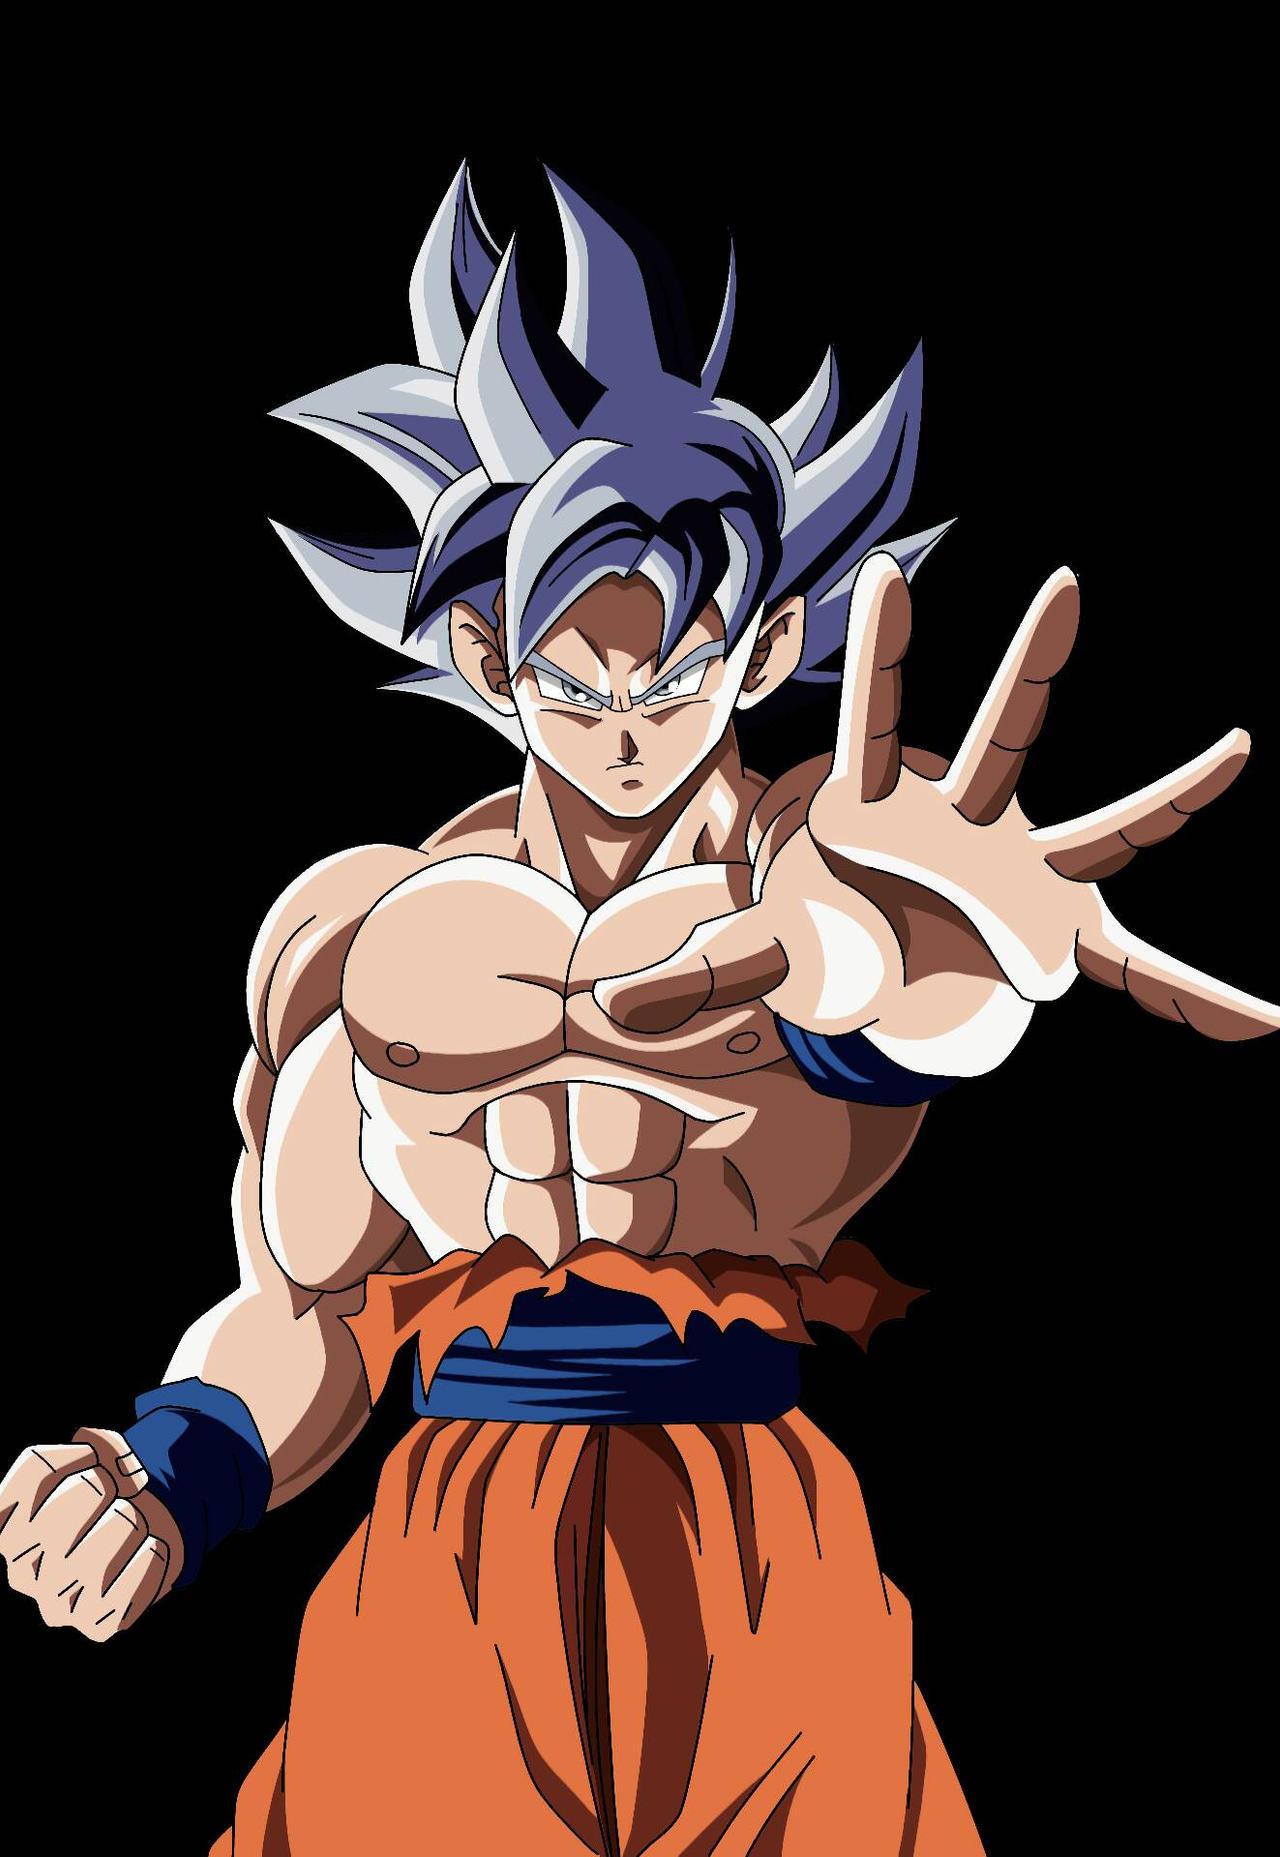 Goku Ultra Instinto Dominado Render By Alejandrodbs On Deviantart